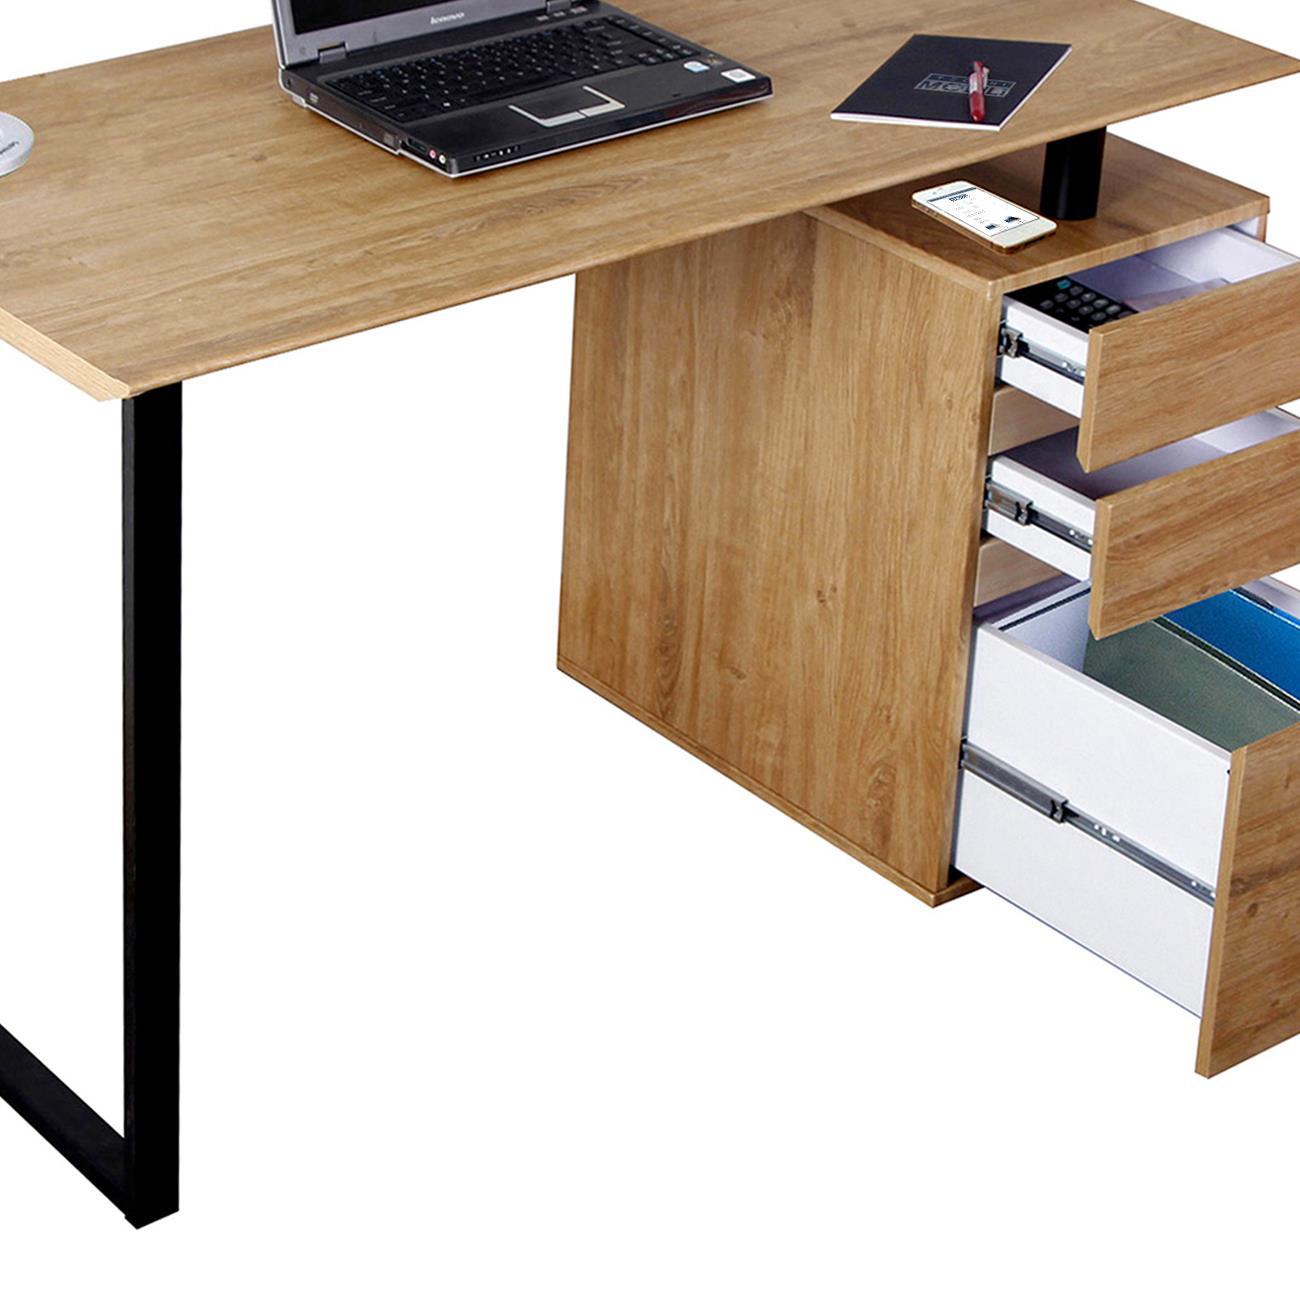 Techni mobili computer desk with storage and file cabinet for Mobili computer